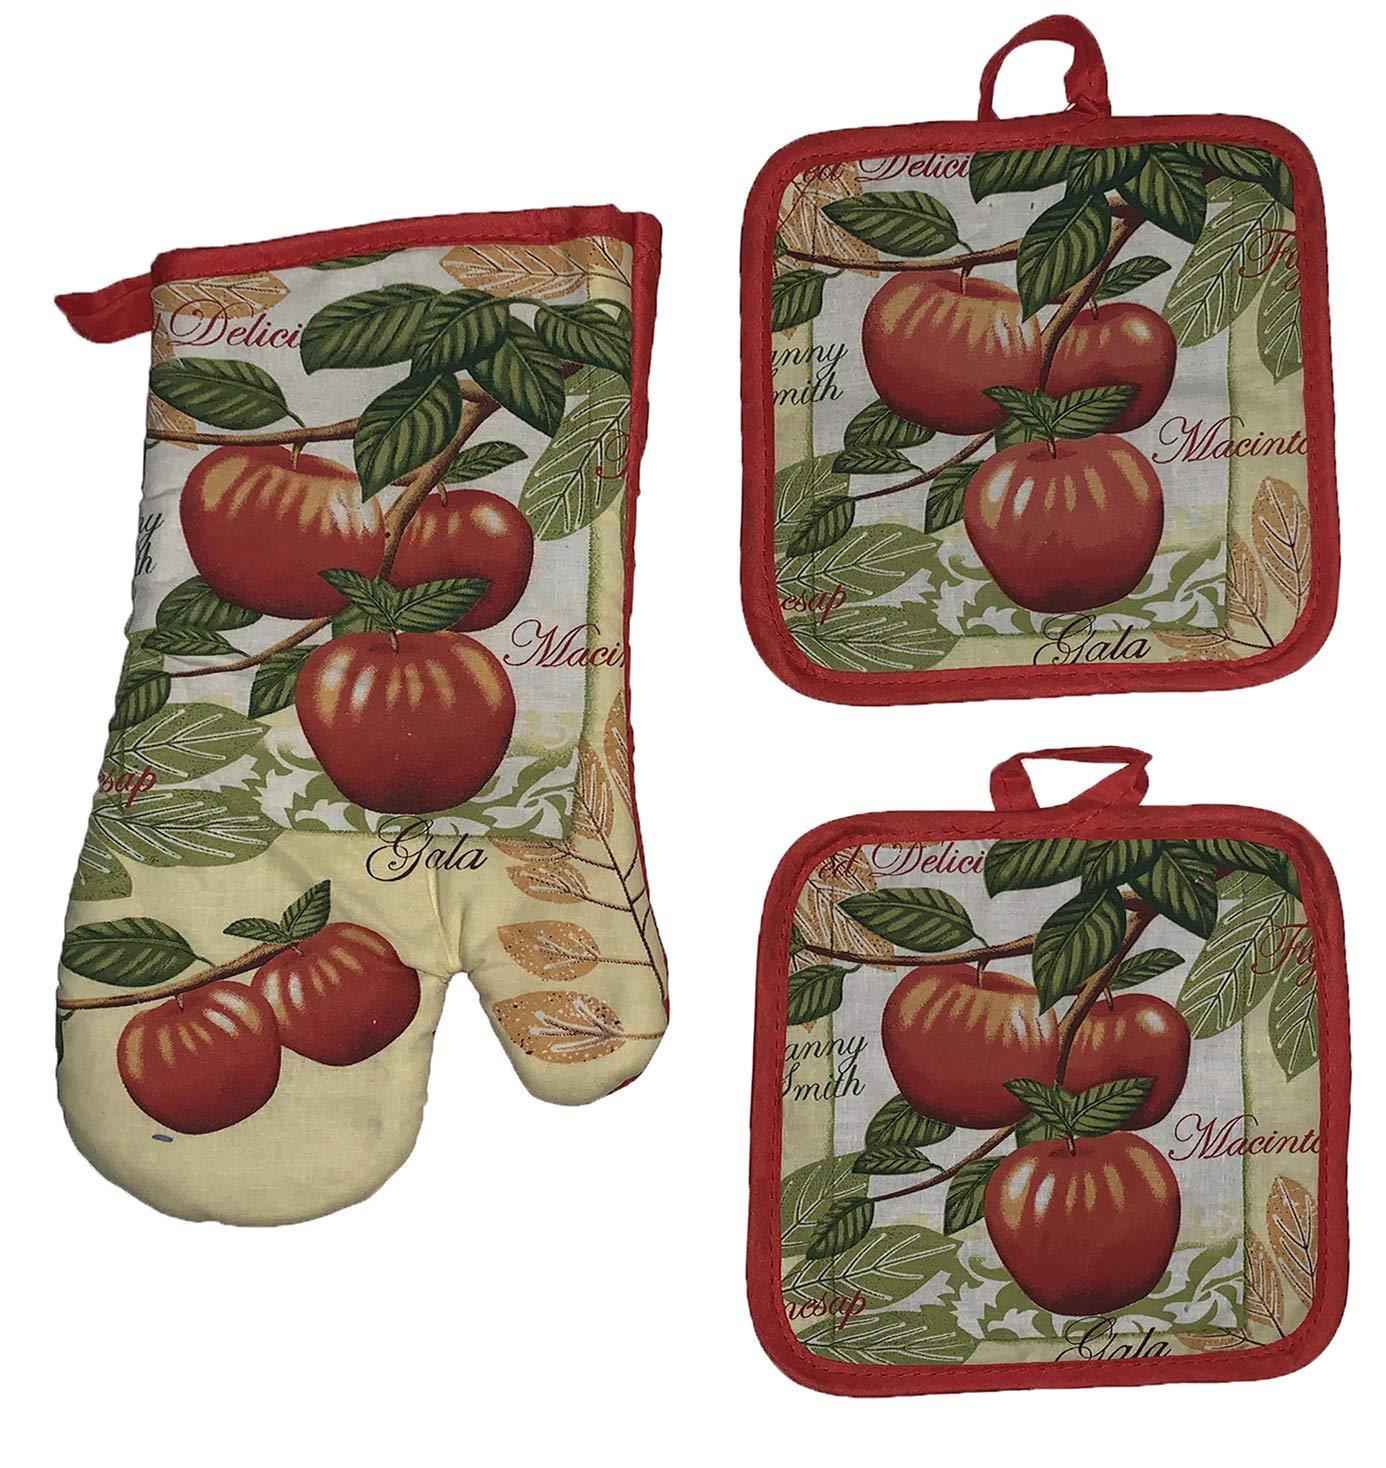 Cotton Konnection Set of 3, Fruit Print Decorative Kitchen Set Includes 1  Oven Mitt, 2 Pot Holders. (Gala Apple)